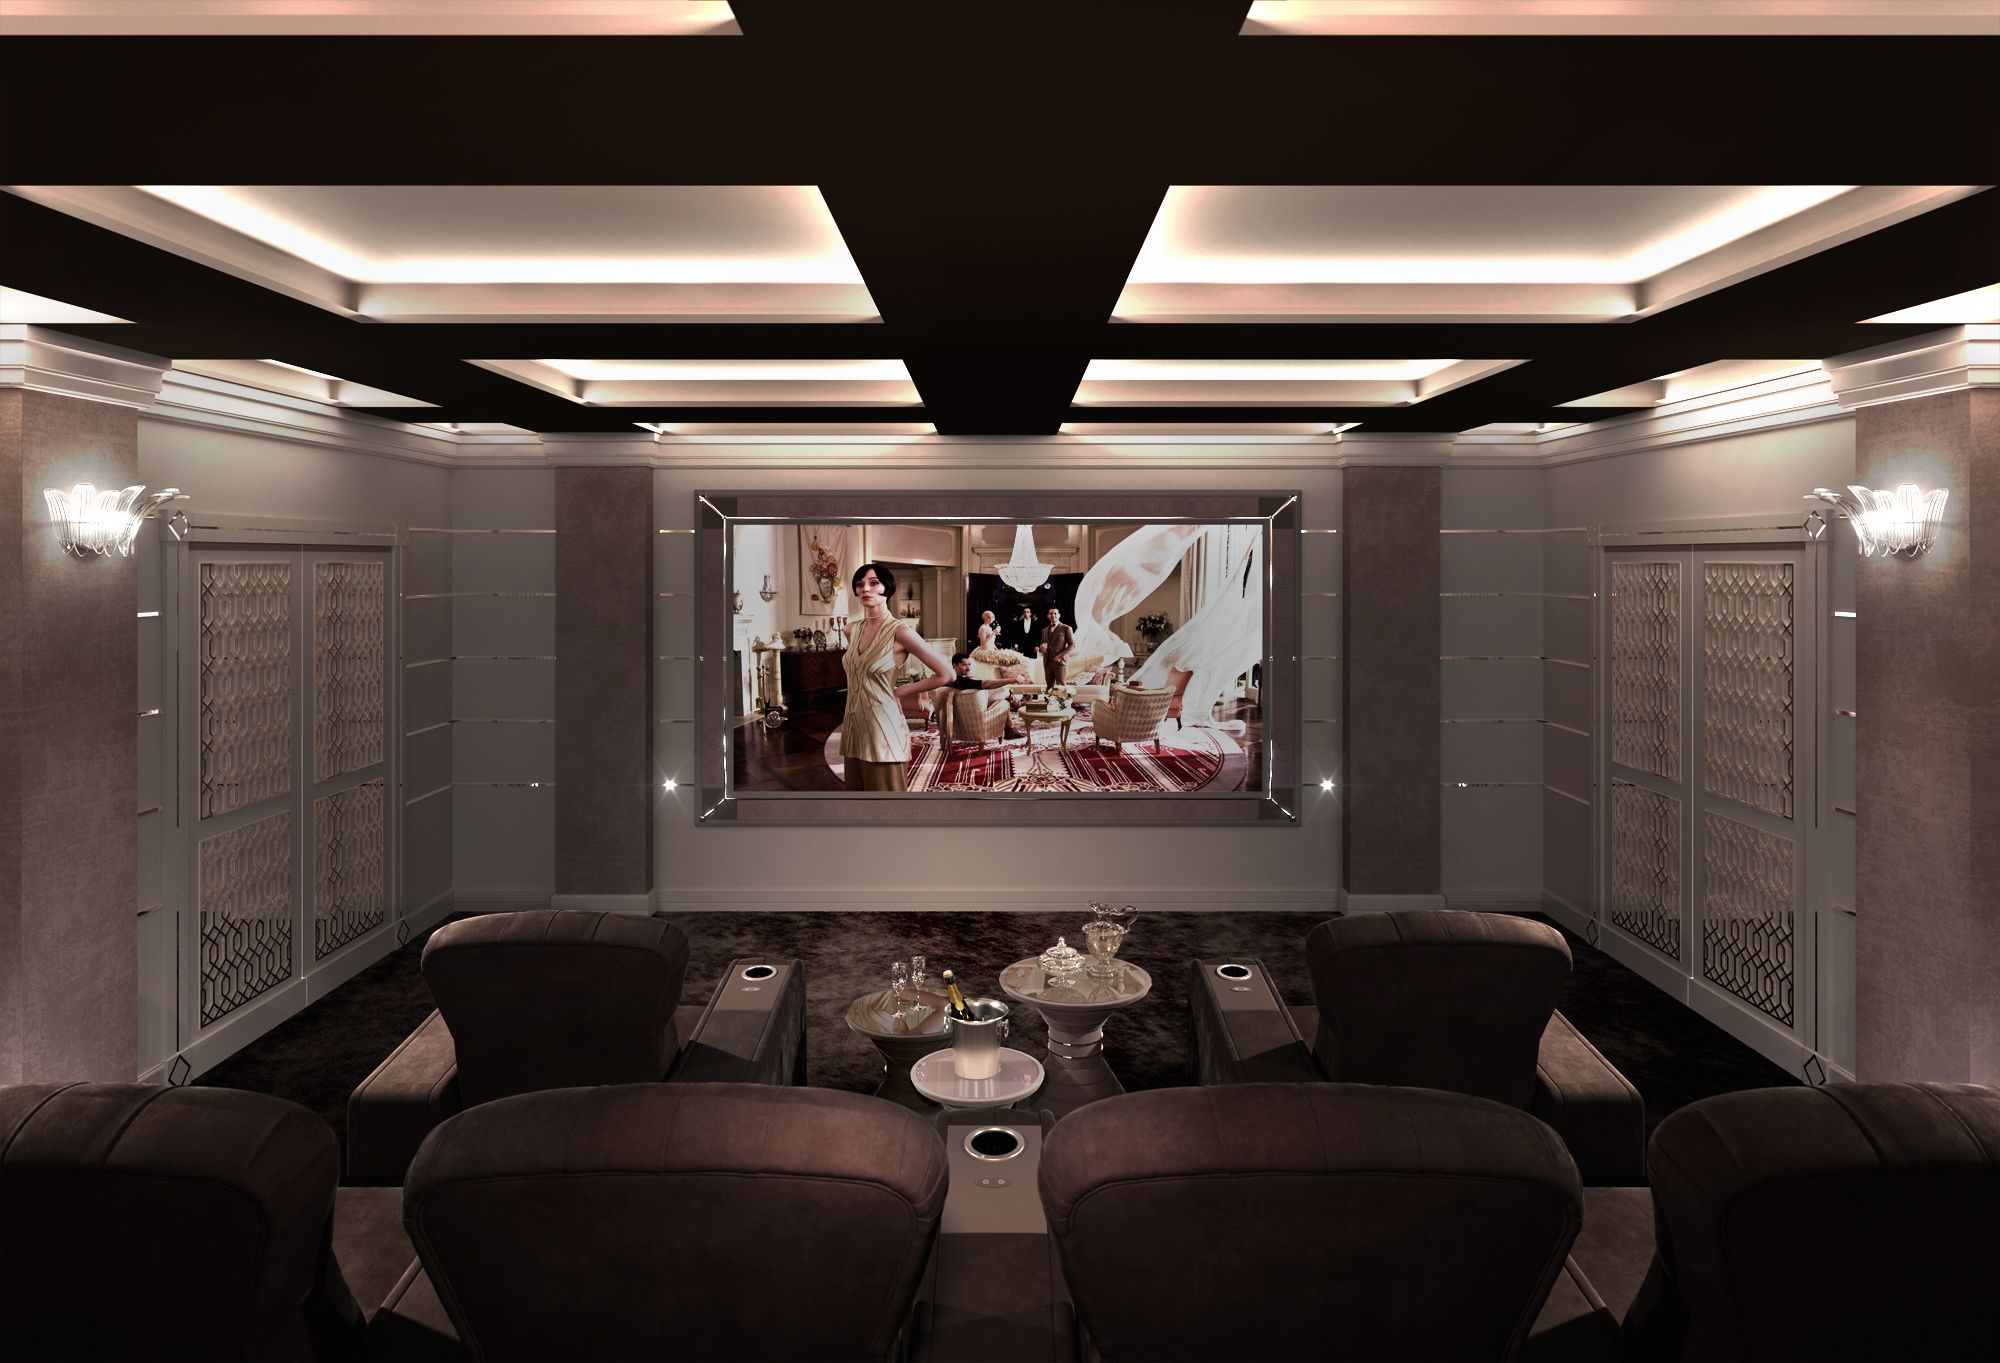 Sala Cinema Cinema -> Imagem De Sala De Cinema